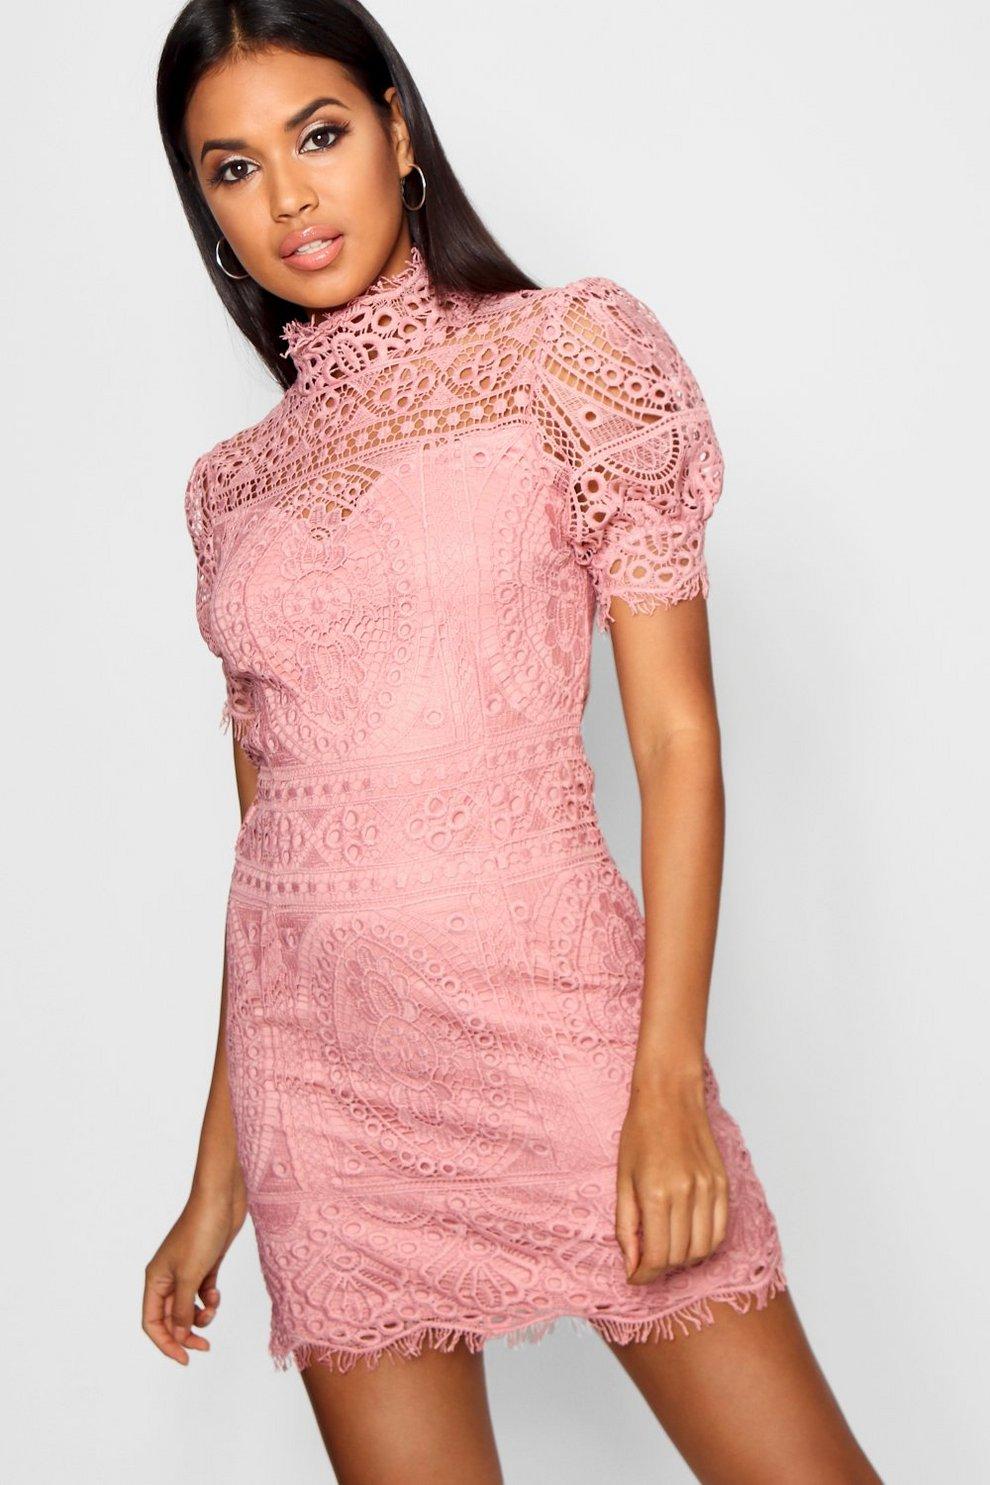 b4928c8d37 Womens Blush Lace Puff Sleeve Bodycon Dress